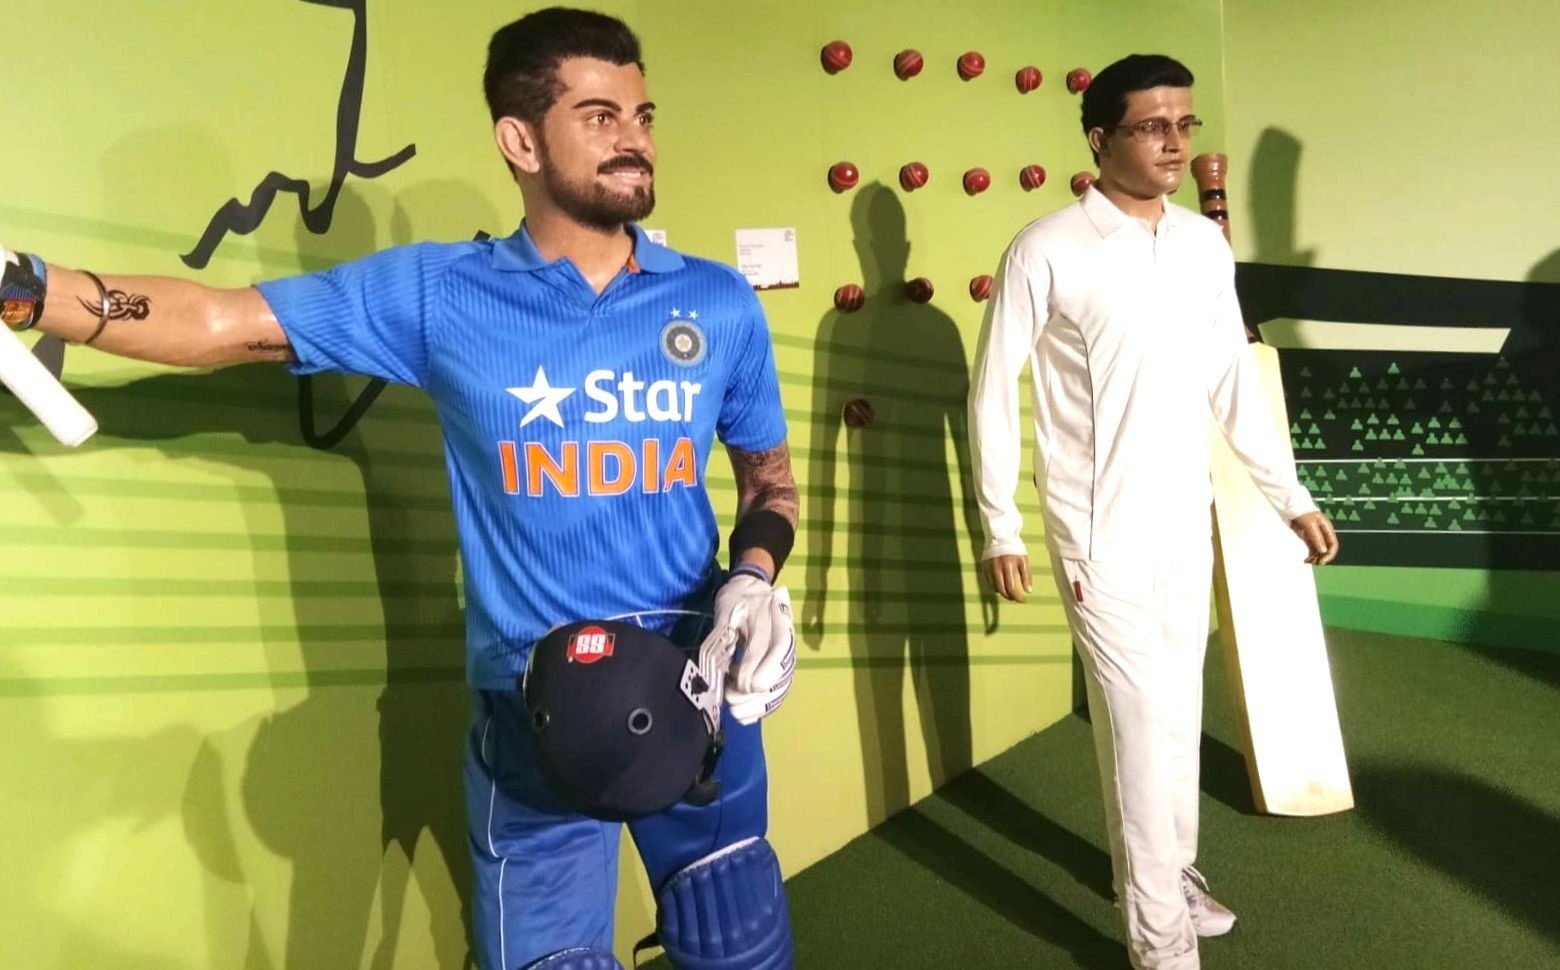 Virat Kohli, Madame Tussauds, Wax figure, Wax statue, Indian captain, Indian skipper, Indian cricket team, Sachin Tendulkar, Kapil Dev, Lionel Messi, Cricket news, Sports news